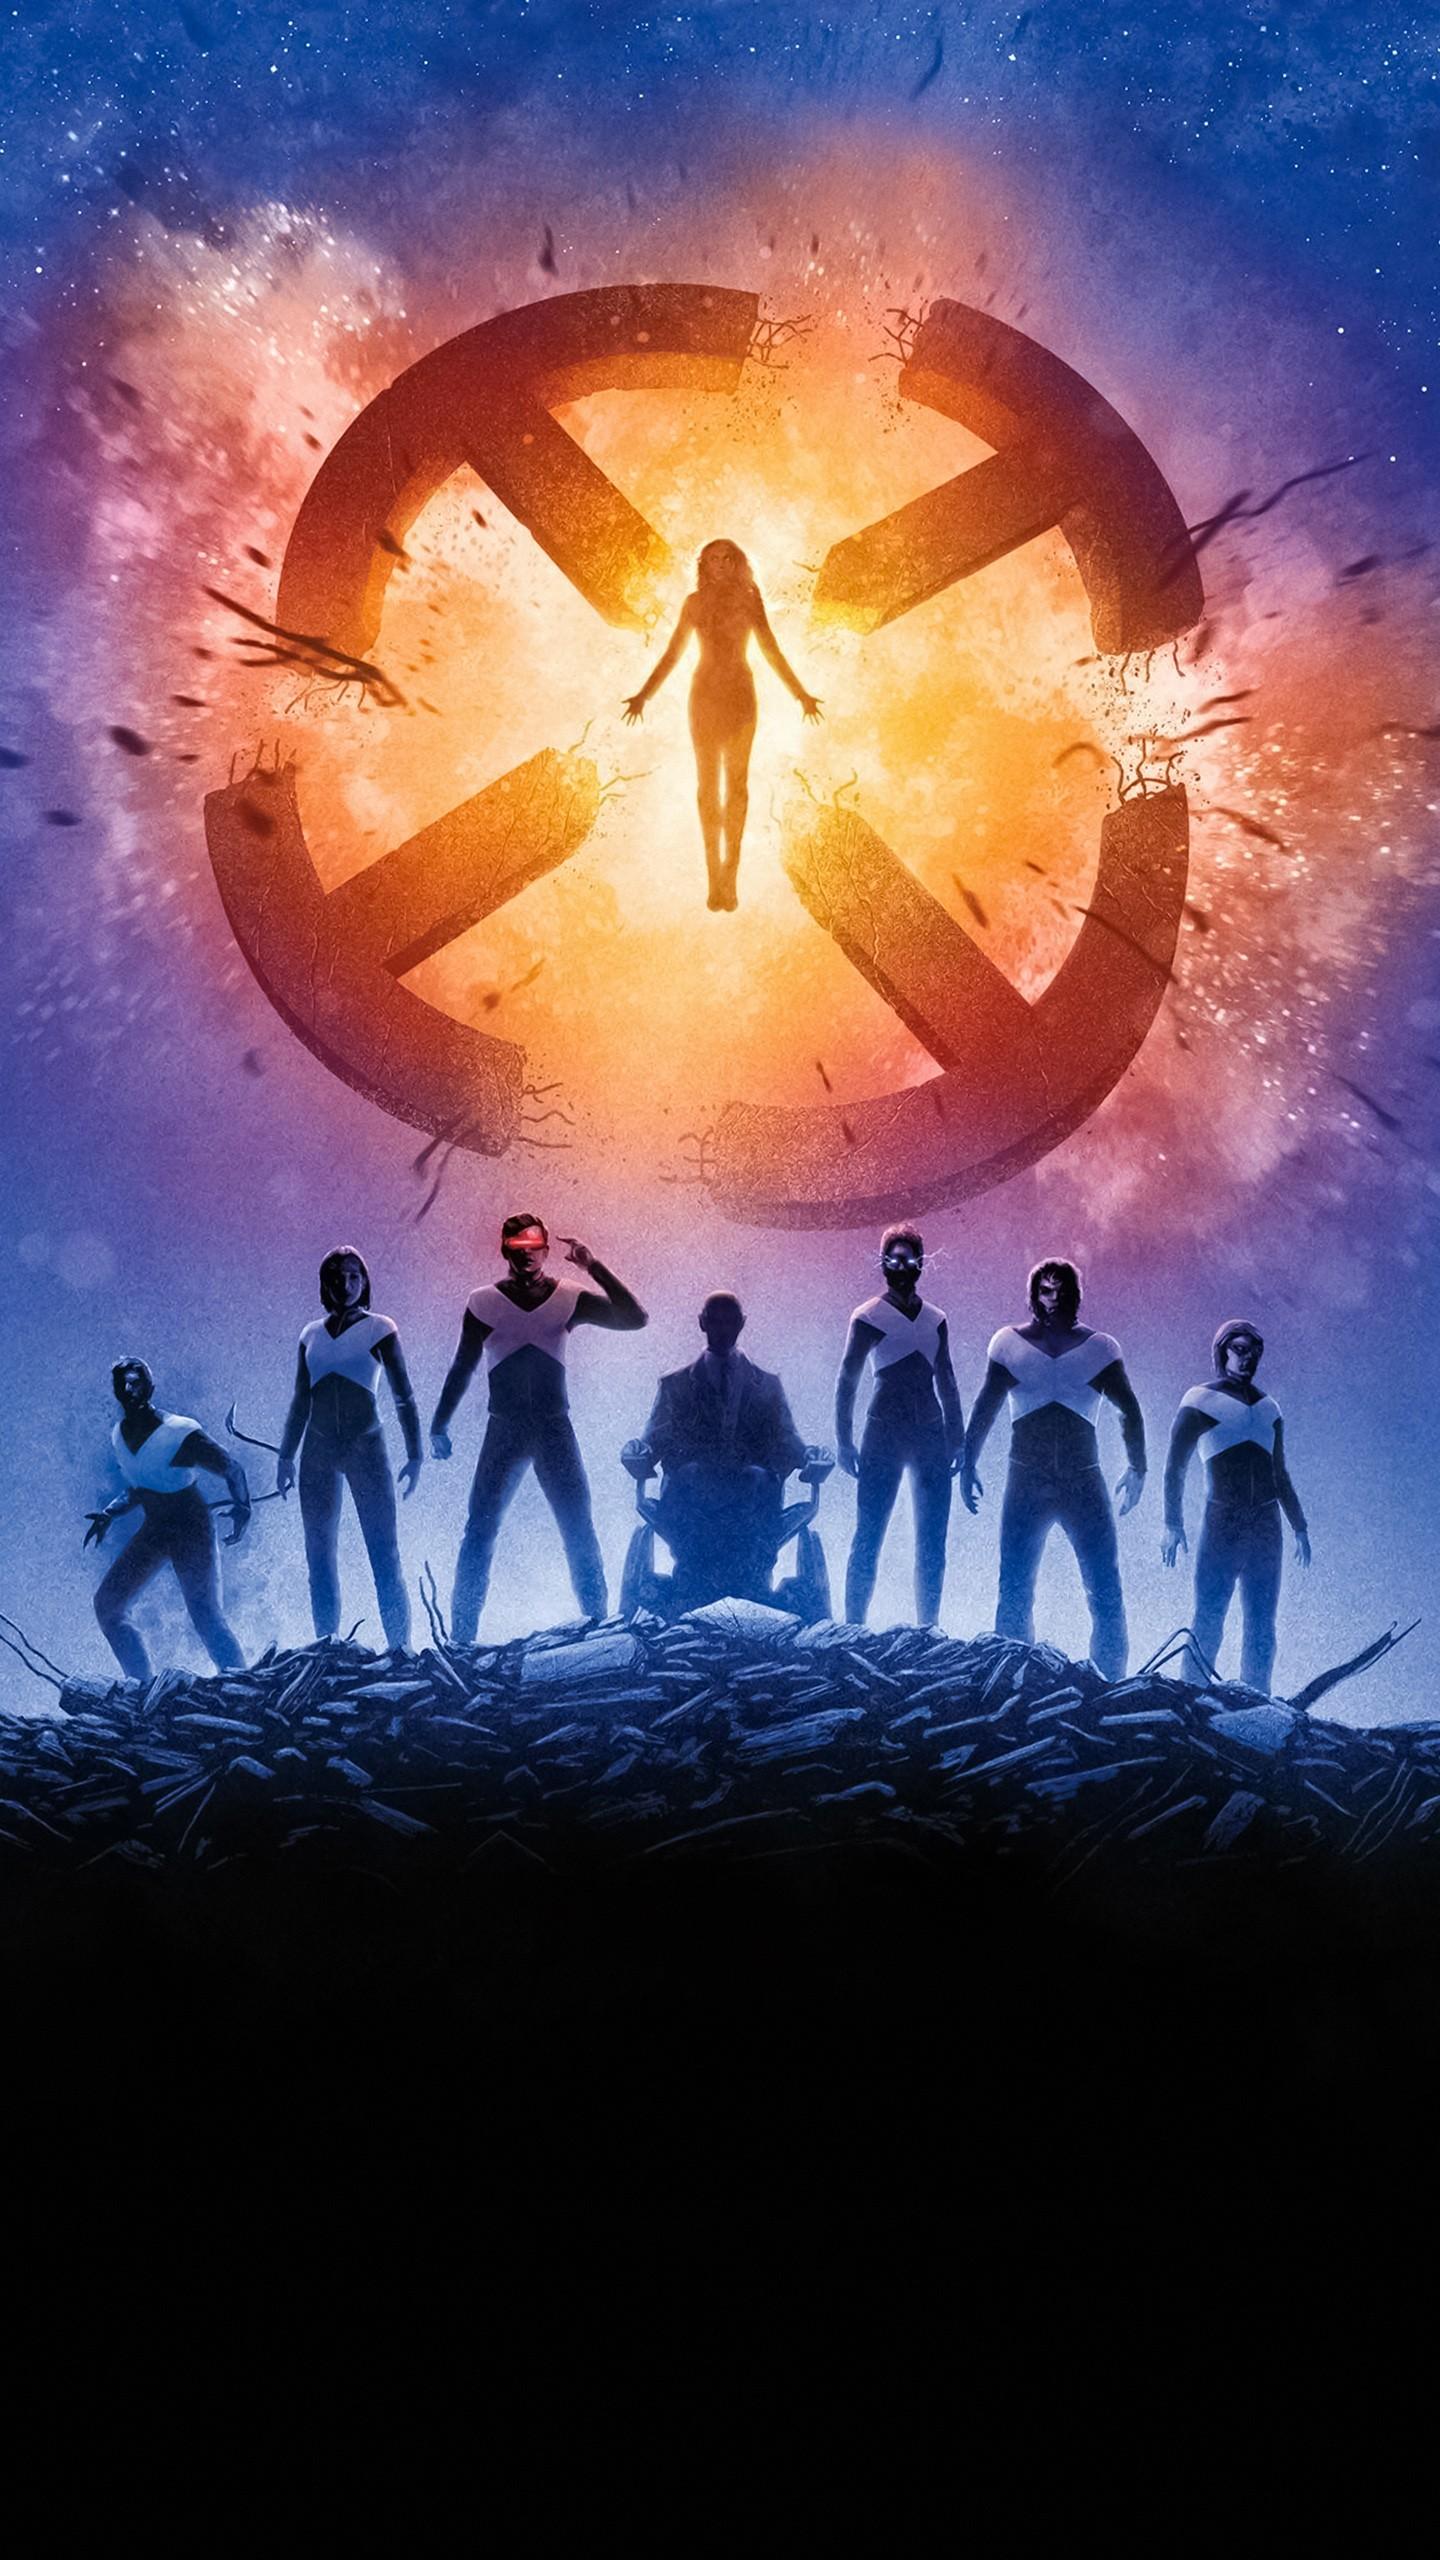 X Men Dark Phoenix Wallpaper Posted By Zoey Mercado